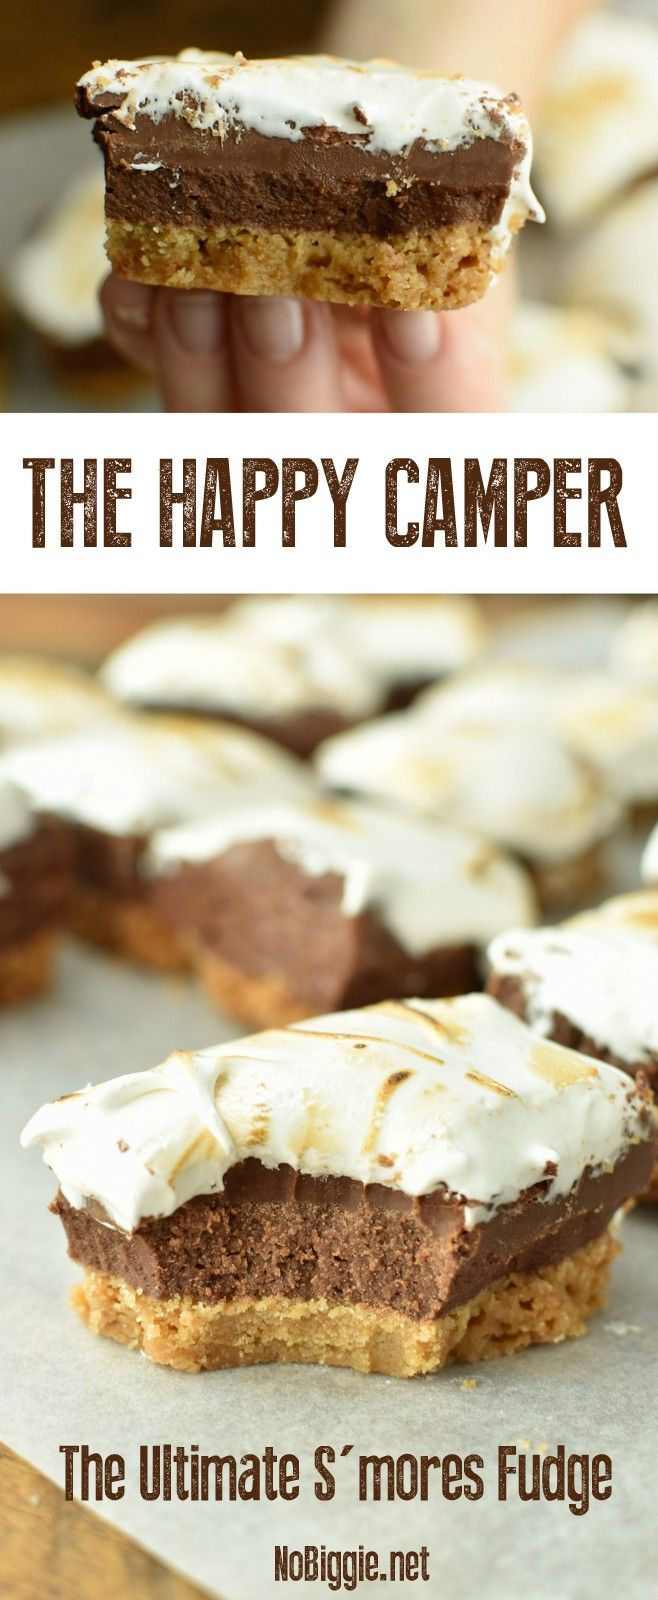 The Happy Camper   The Ultimate S'mores Fudge   NoBiggie.net